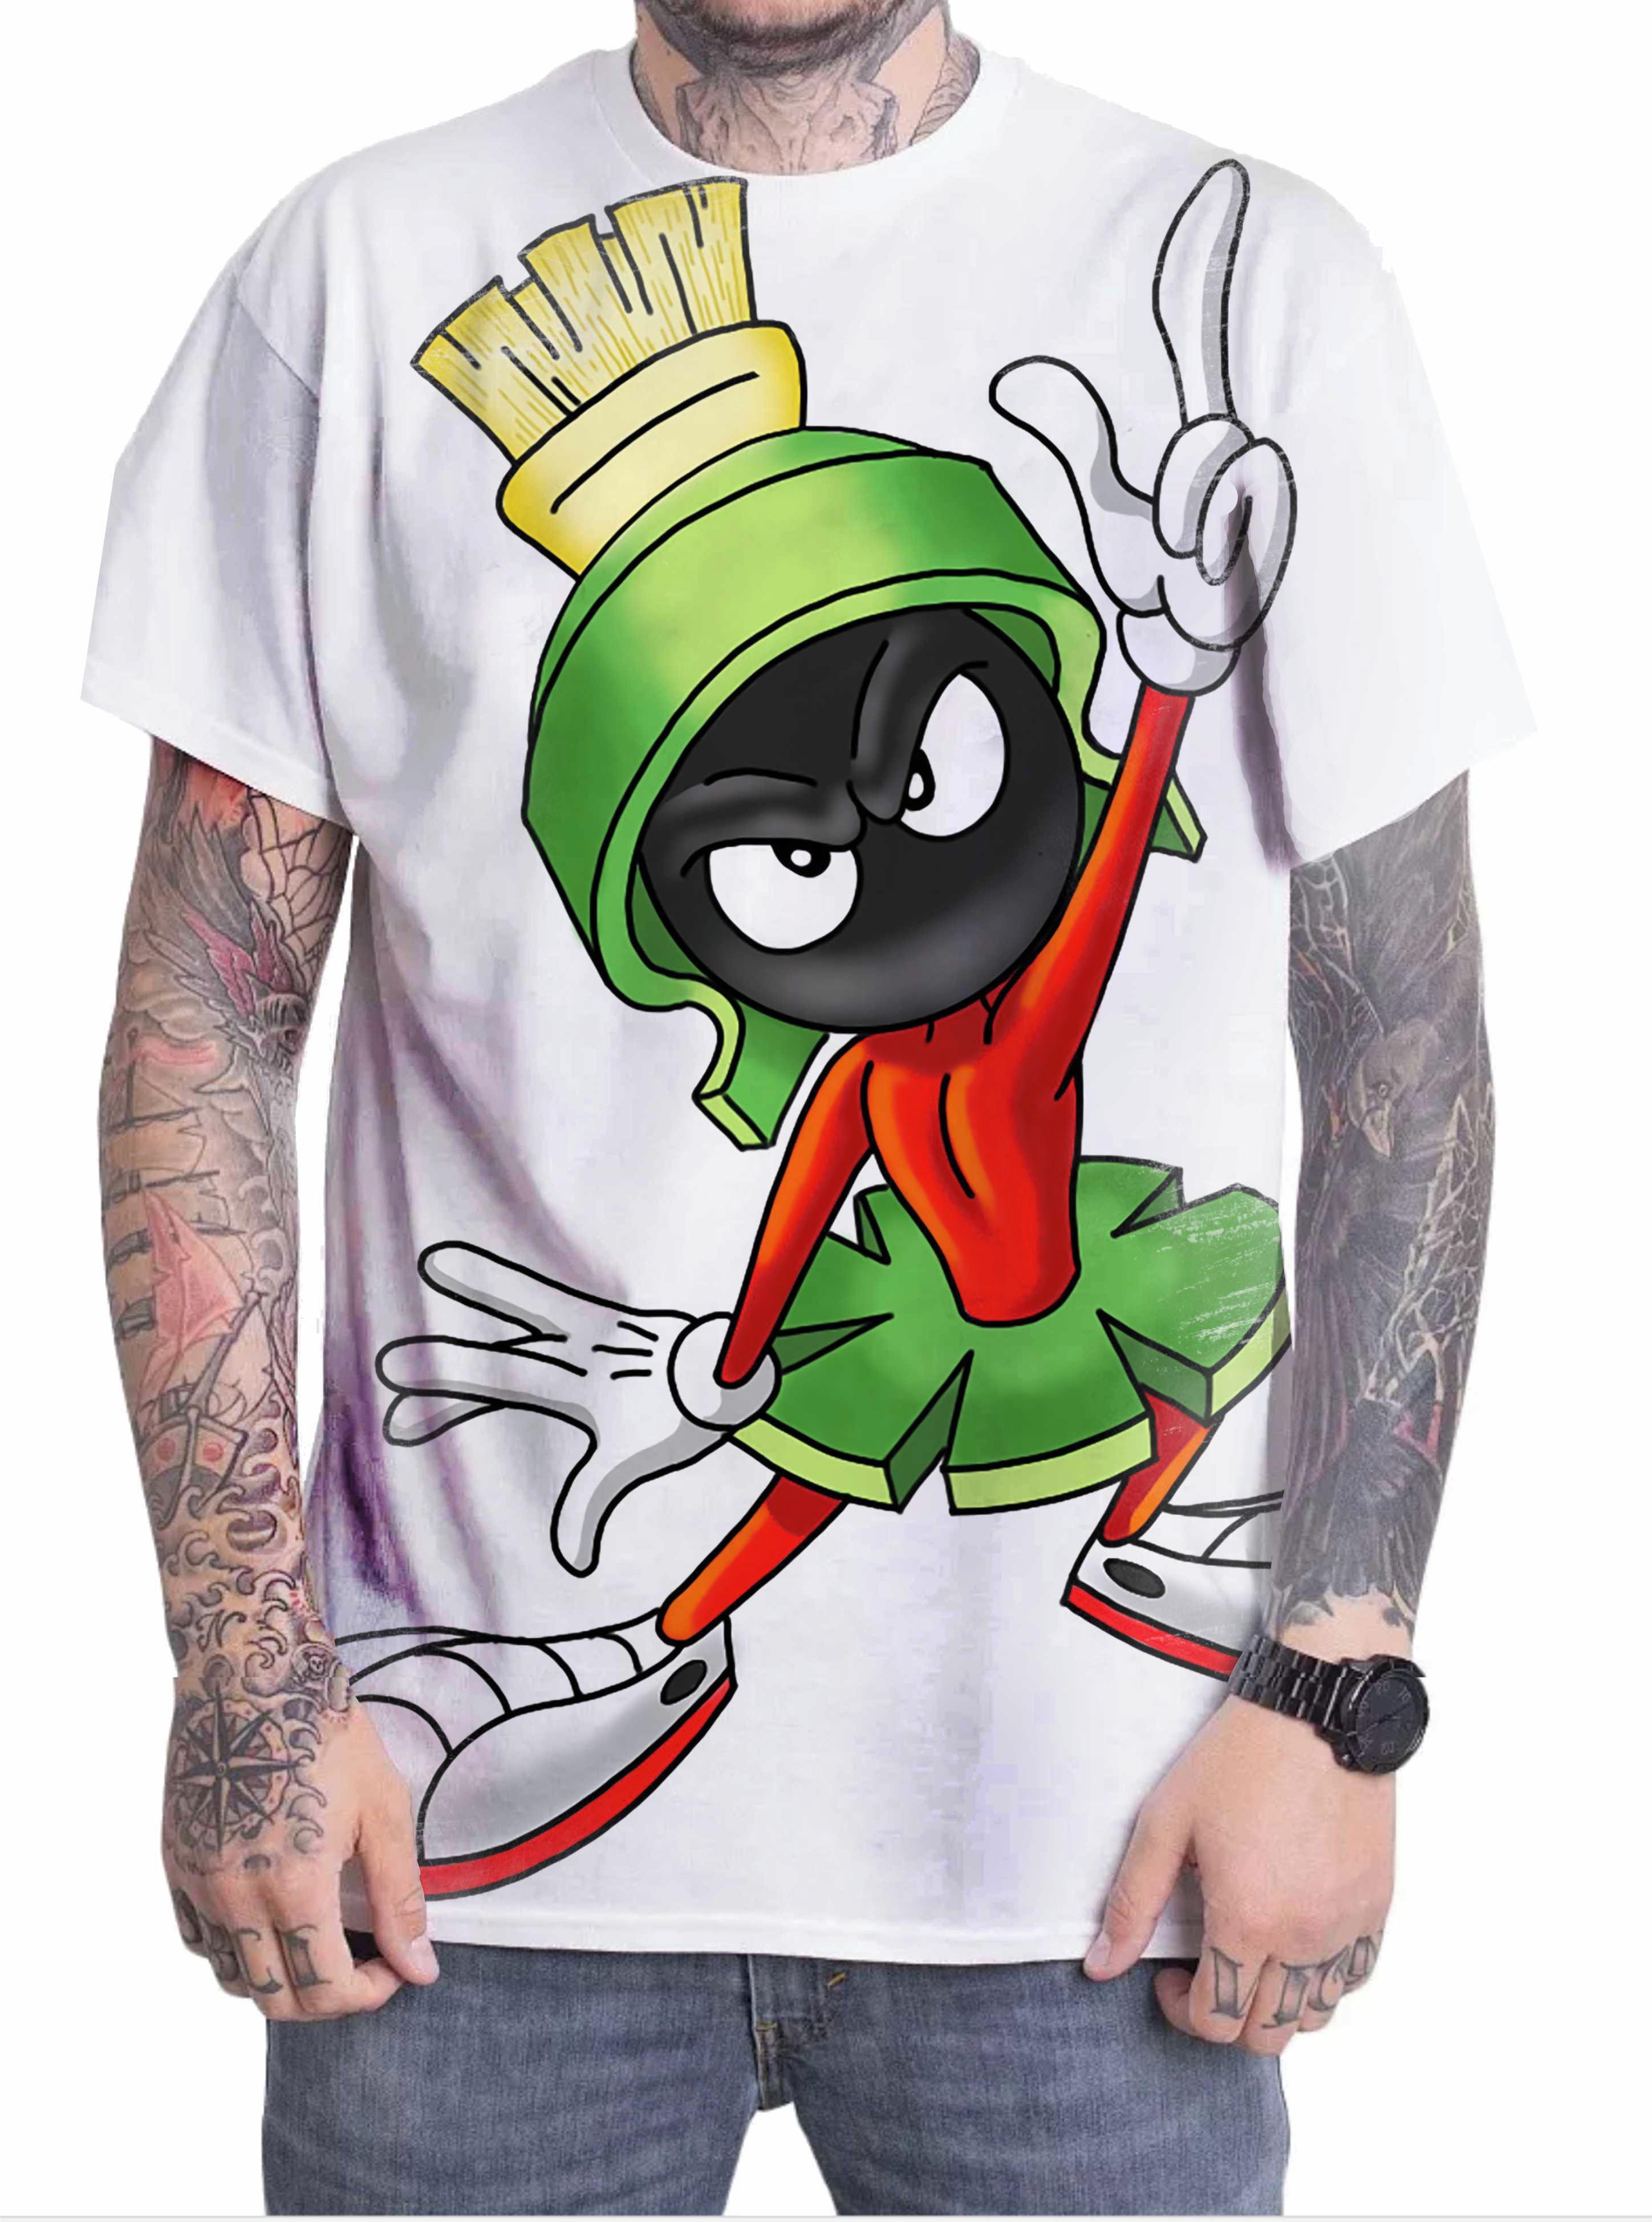 9449ce7ad2 Blusa de Moletom Desenho Looney Tunes